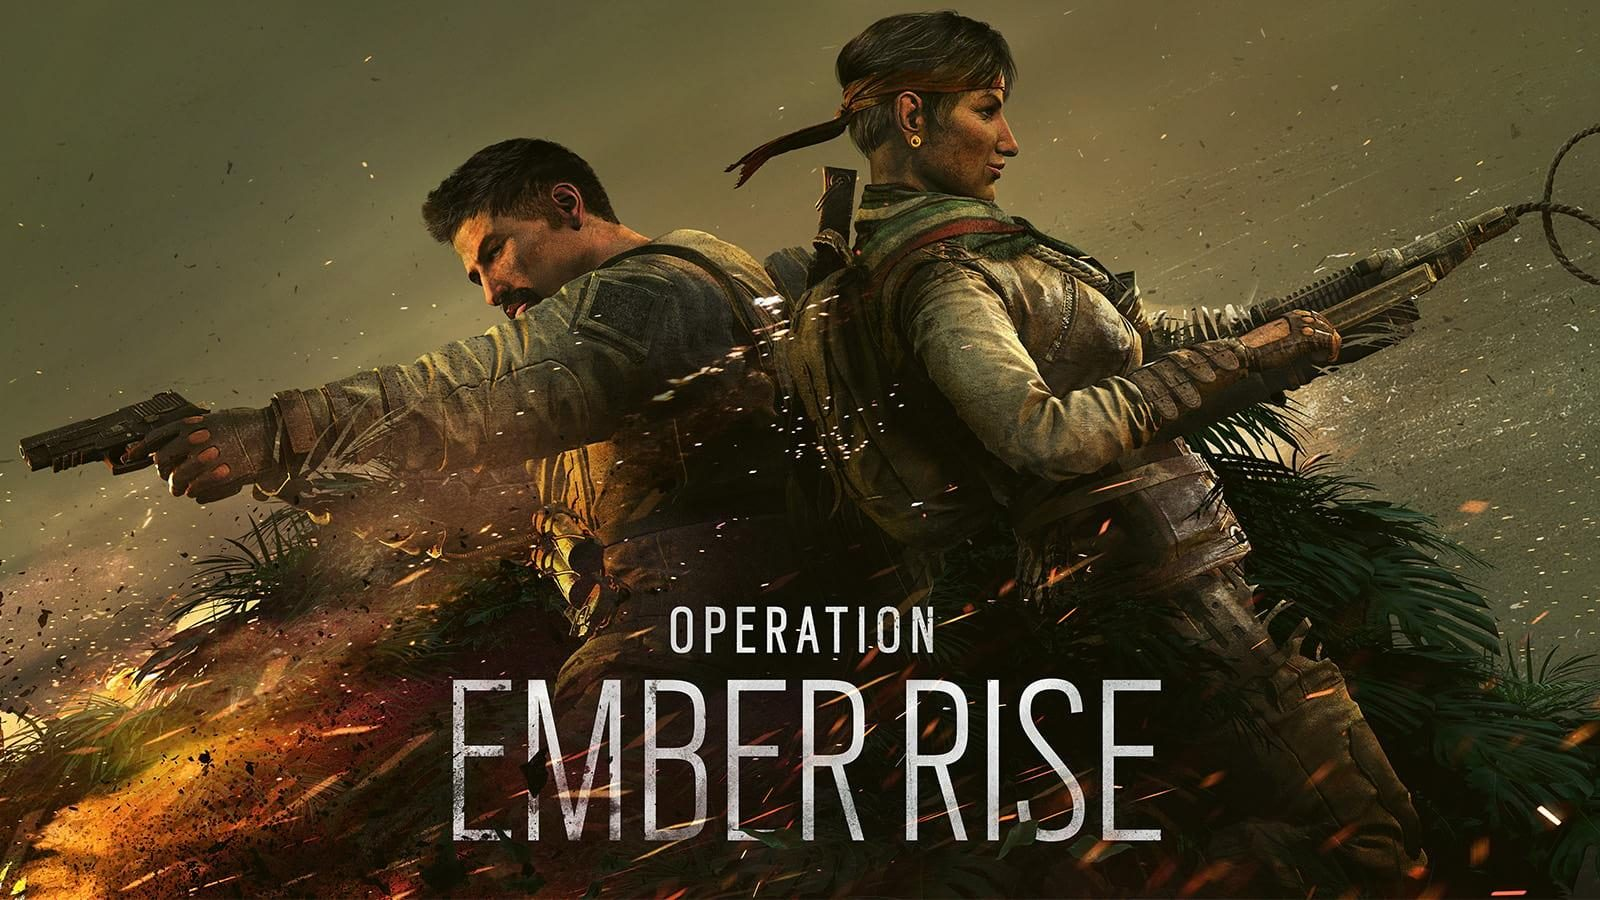 Rainbow Six Siege's new season, Operation Ember Rise